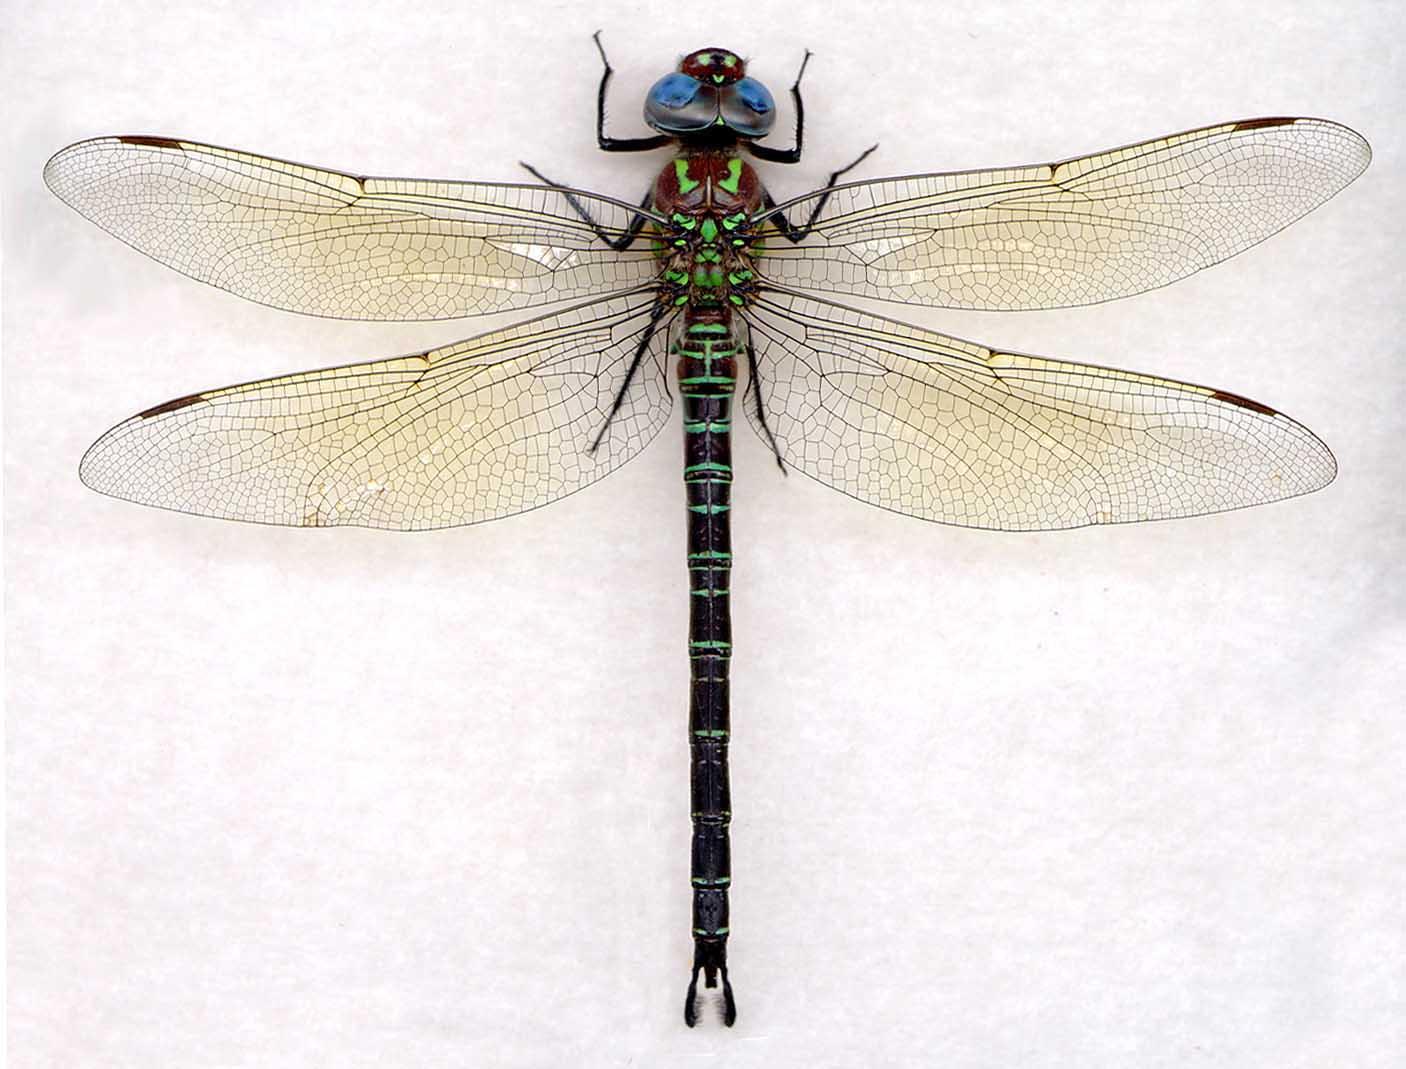 1406x1069 Epiaeschna Heros The Dragonfly Woman